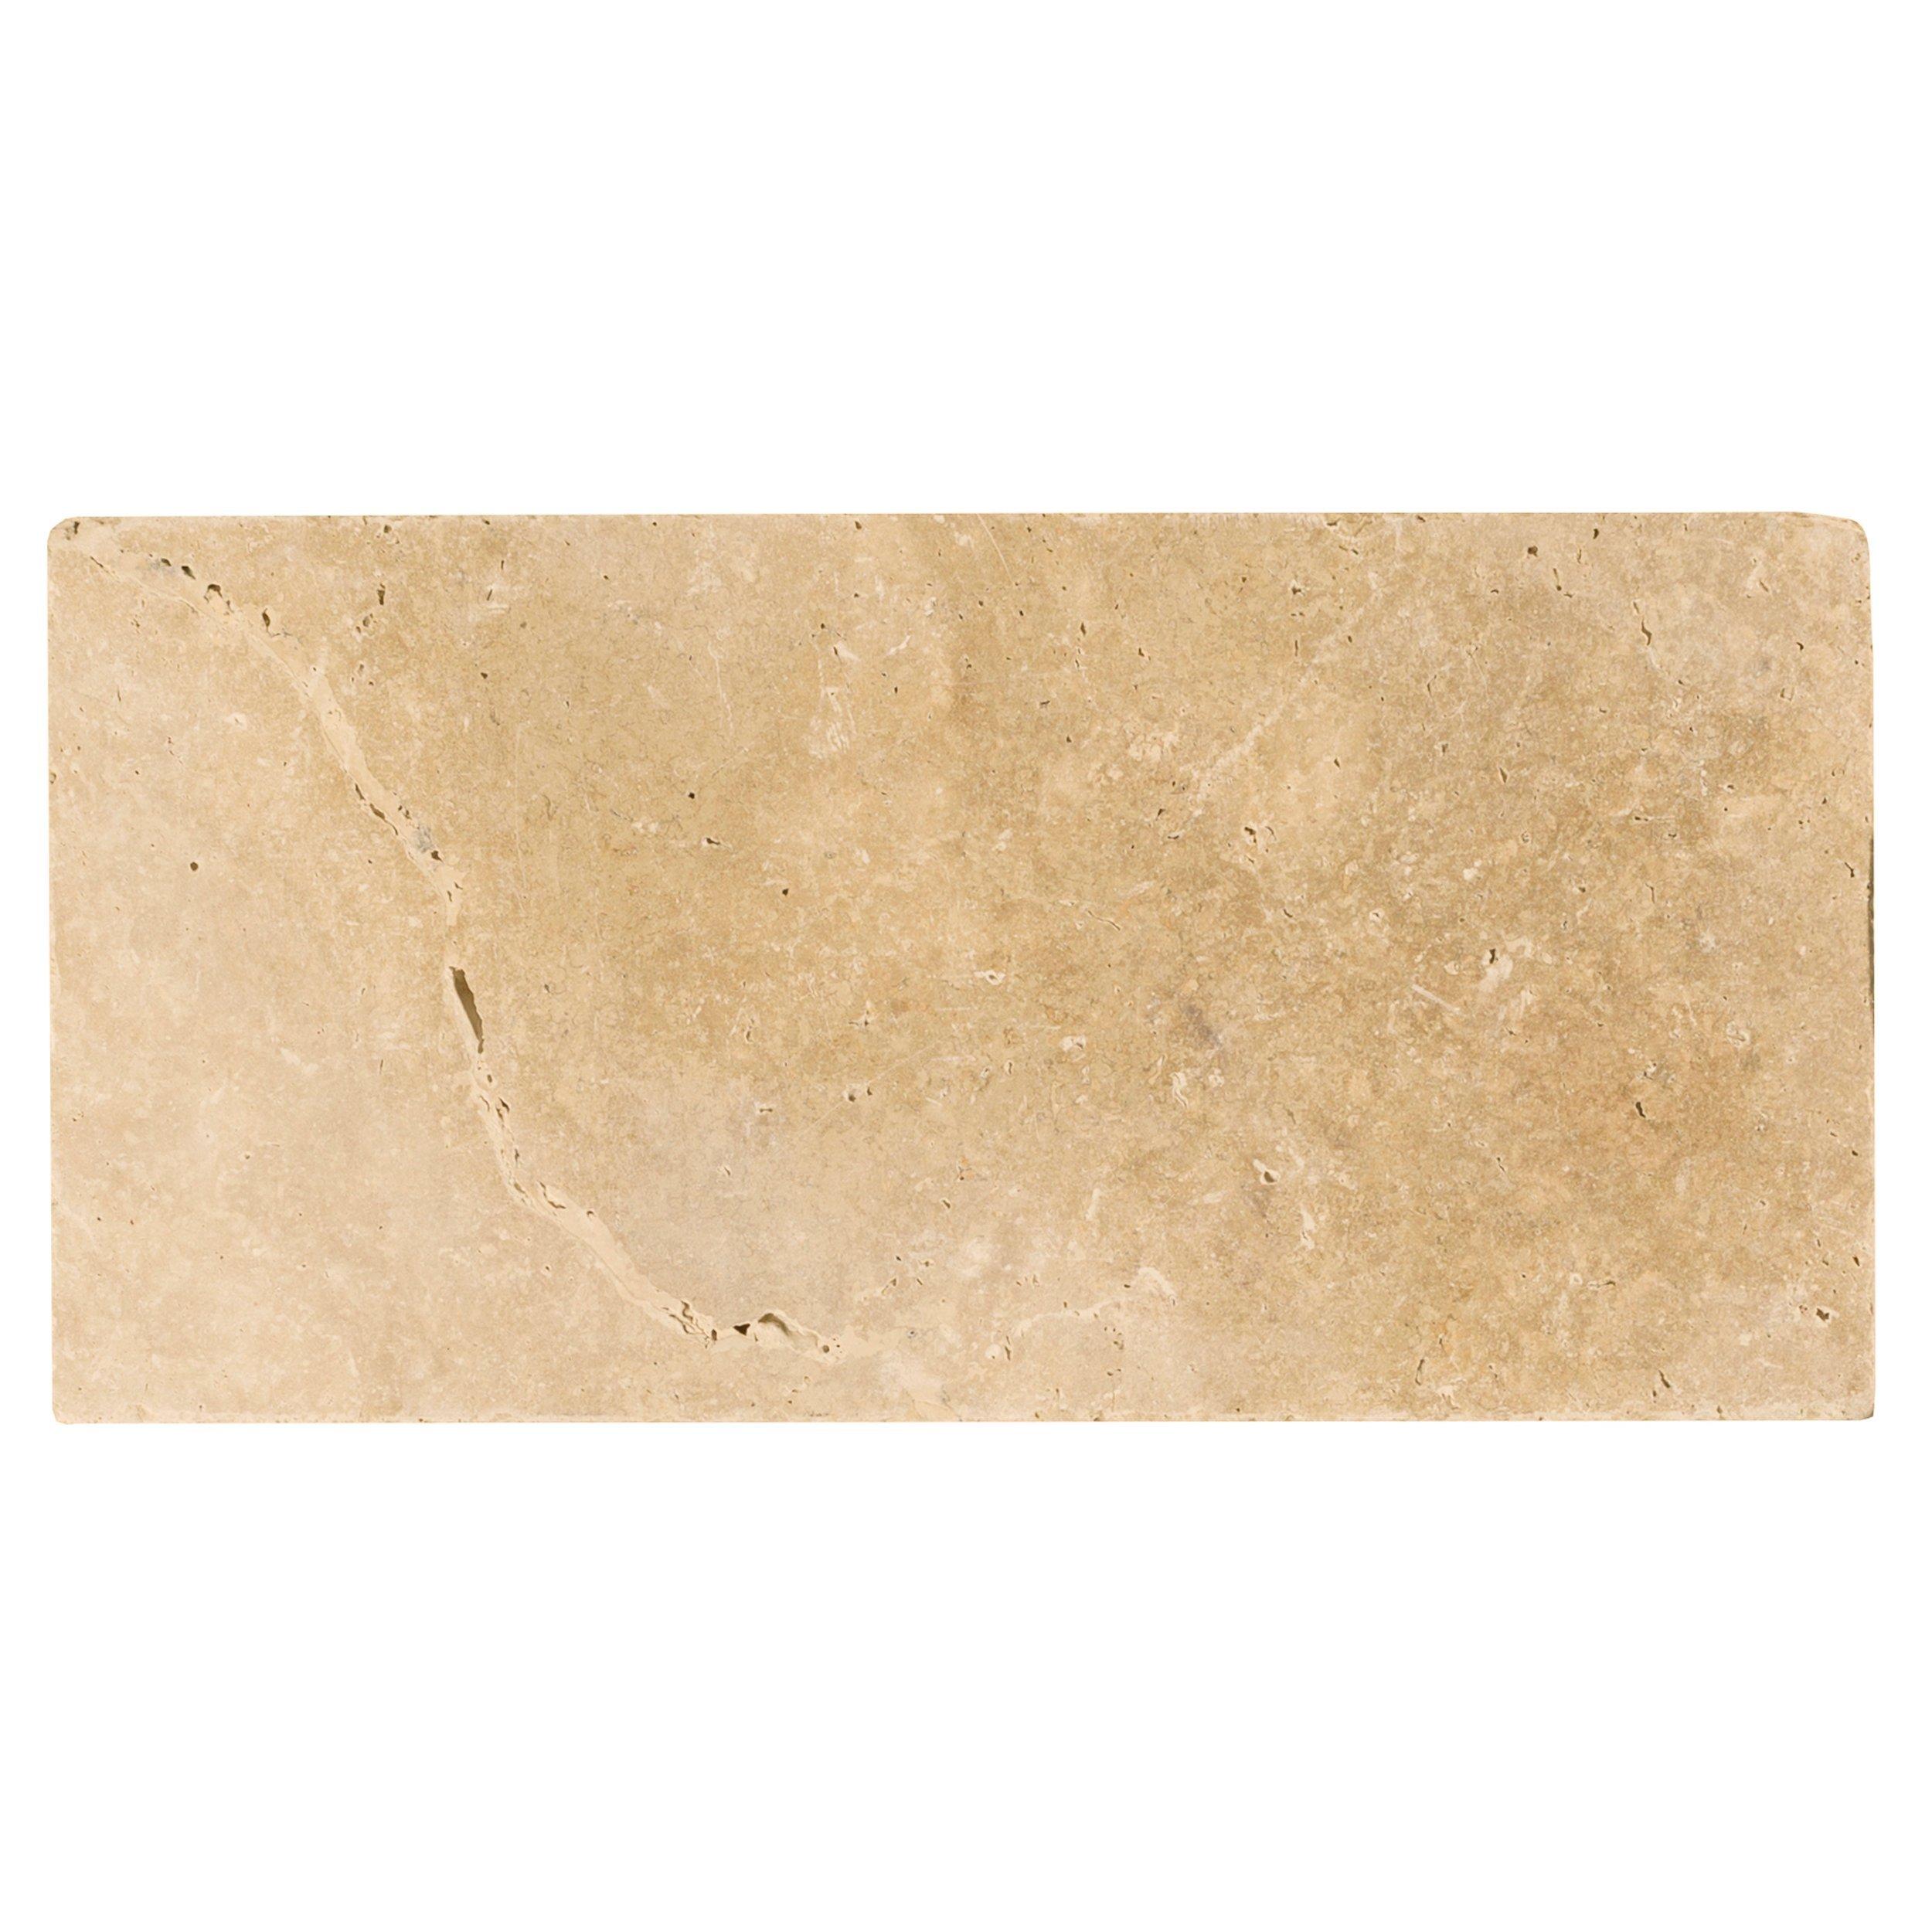 Floor And Decor Denver Stapleton: Antique Parma Travertine Paver